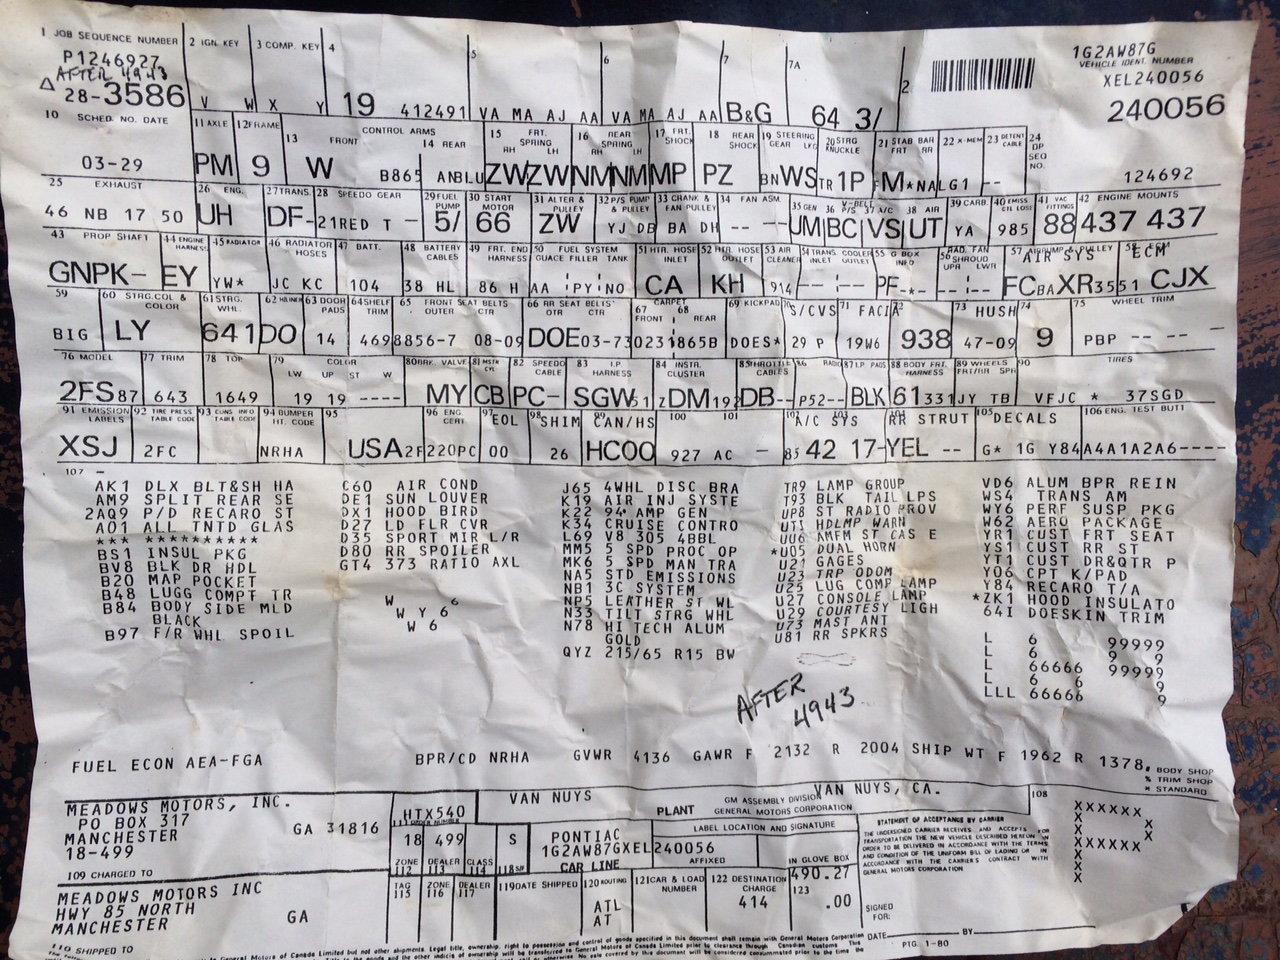 1984 Pontiac Trans Am Y84 Rpo Sheet Found Taped Behind Interior Panel